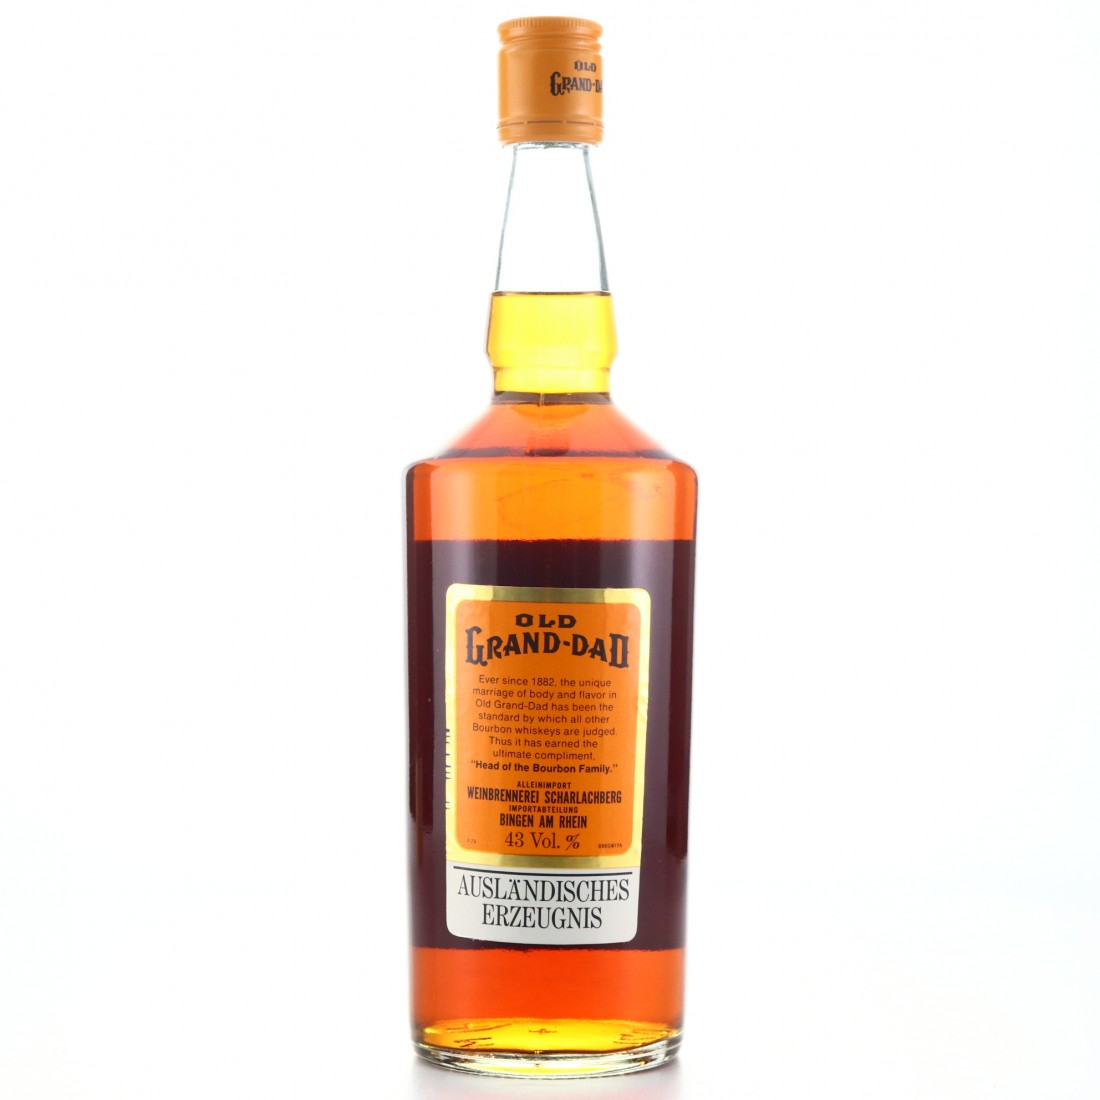 Old Grand-Dad Kentucky Straight Bourbon 1973